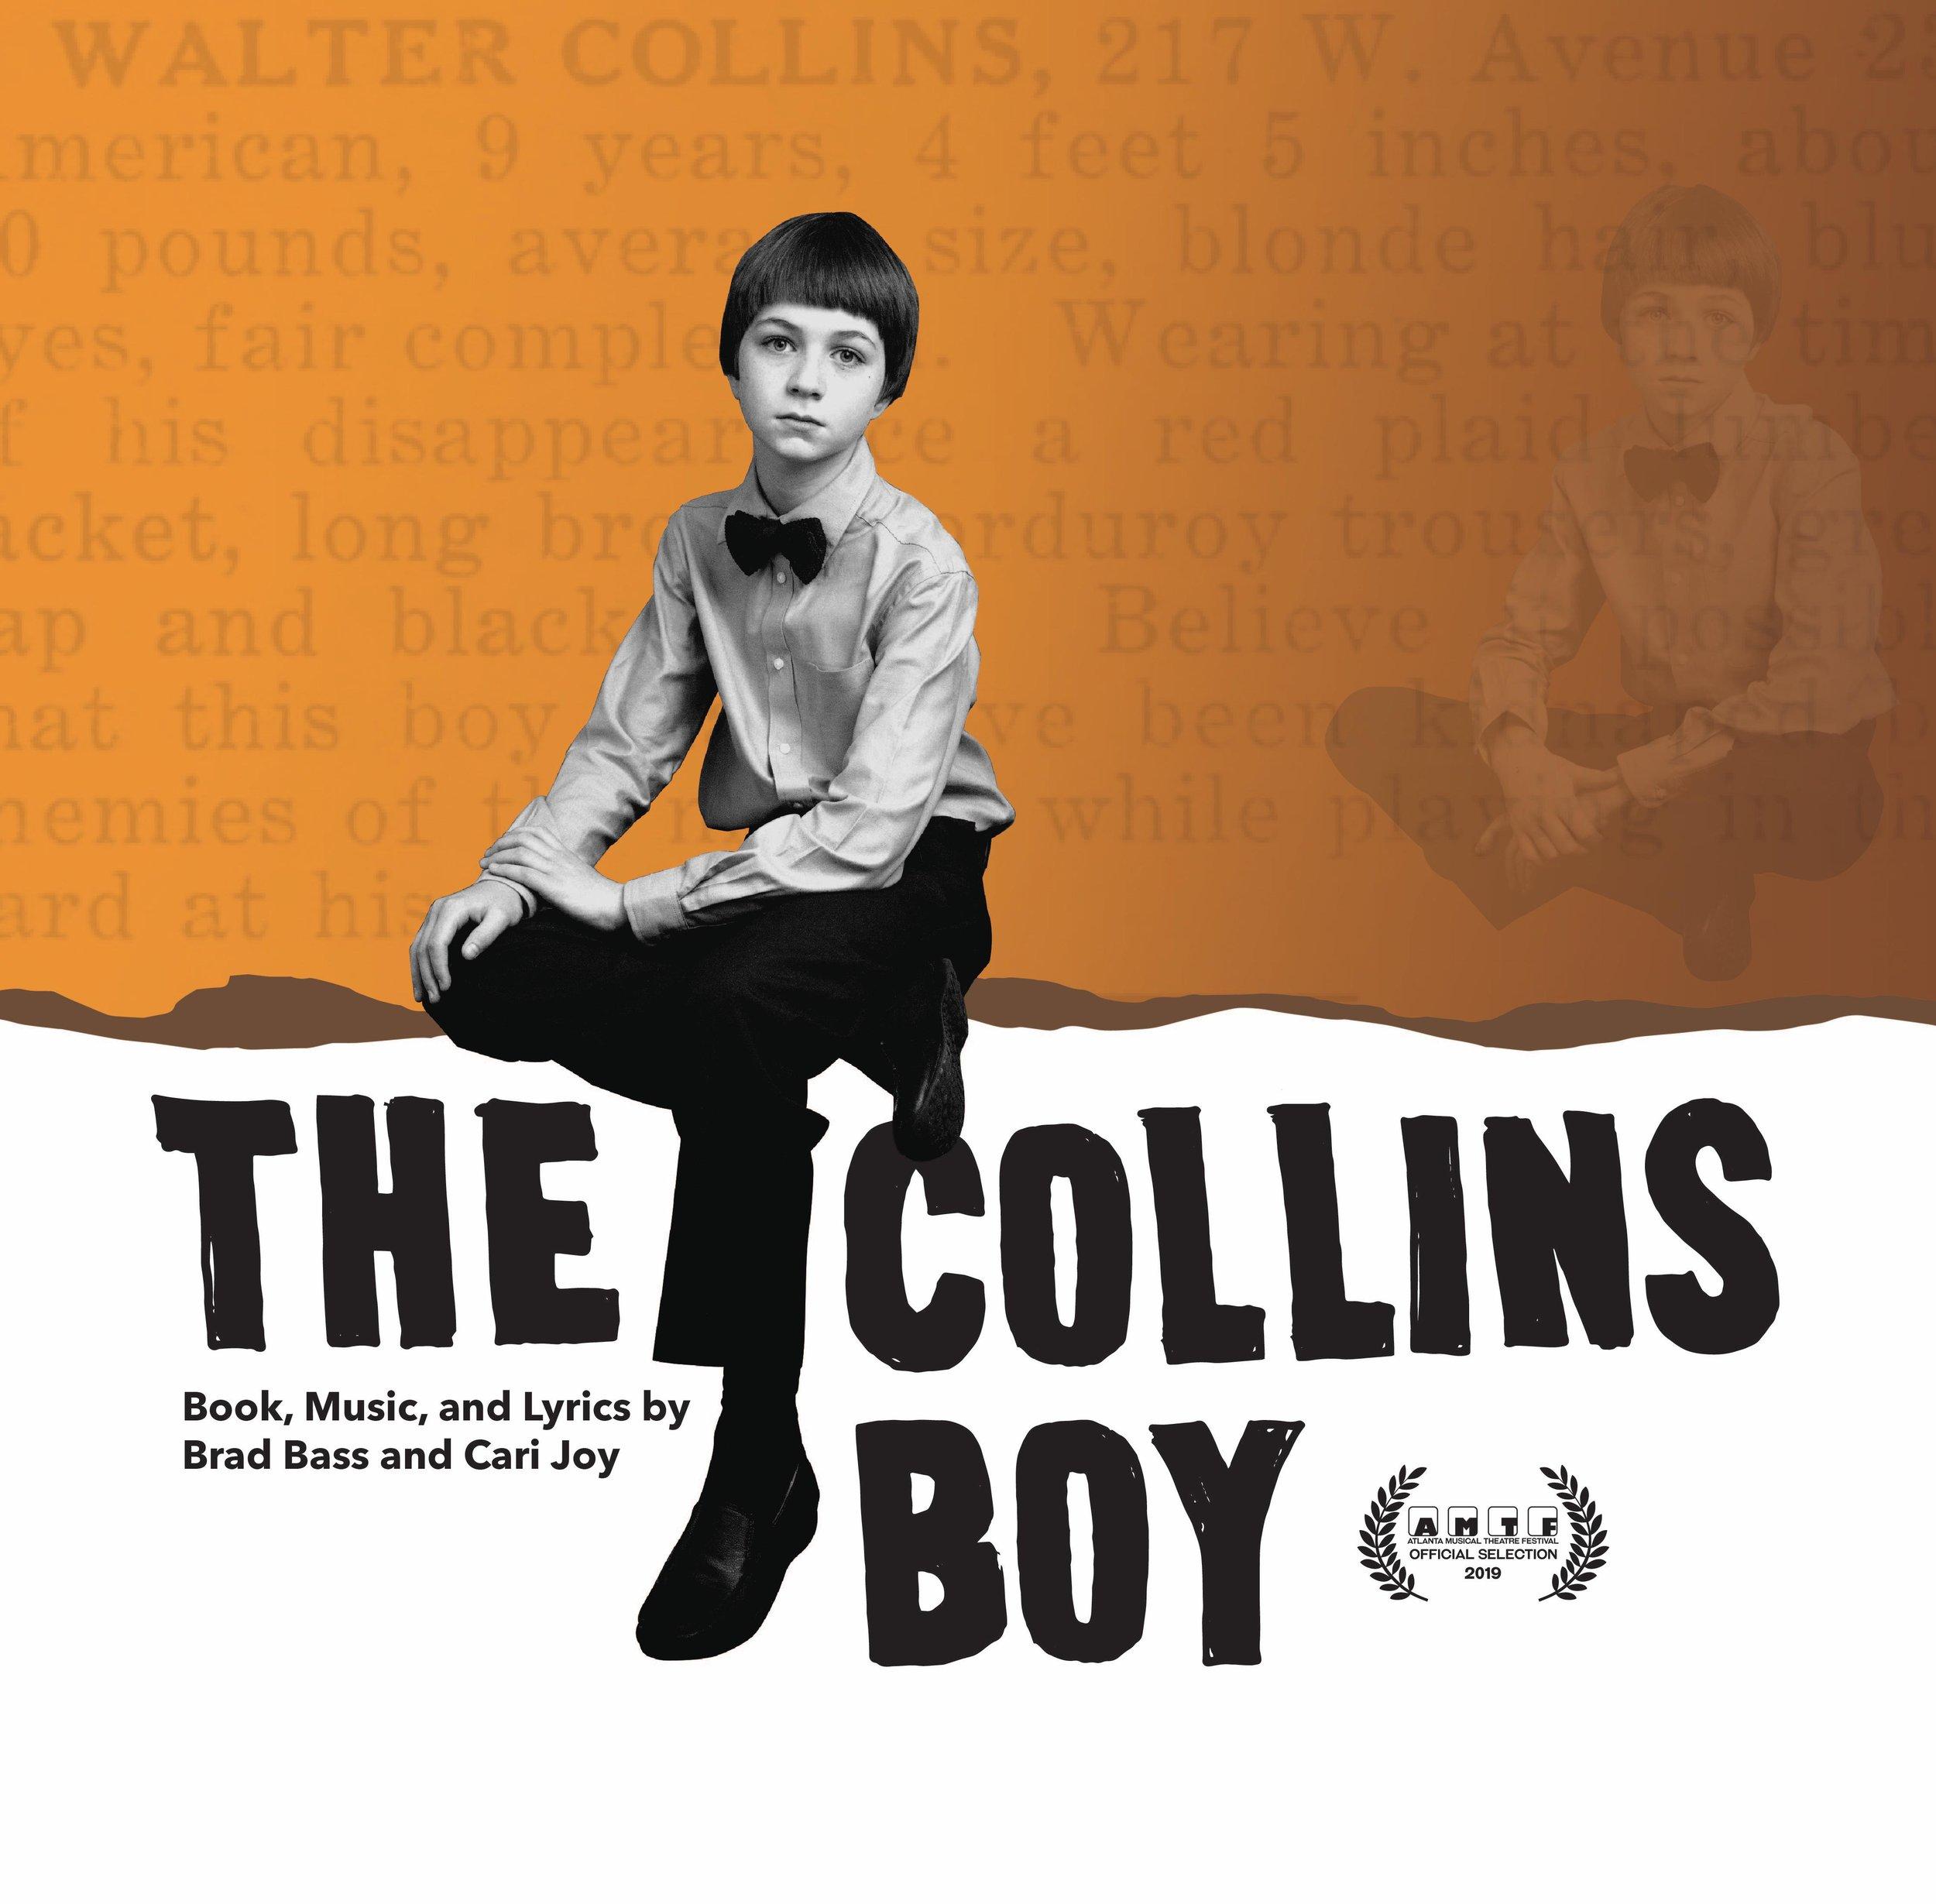 THE COLLINS BOY_IG.jpg